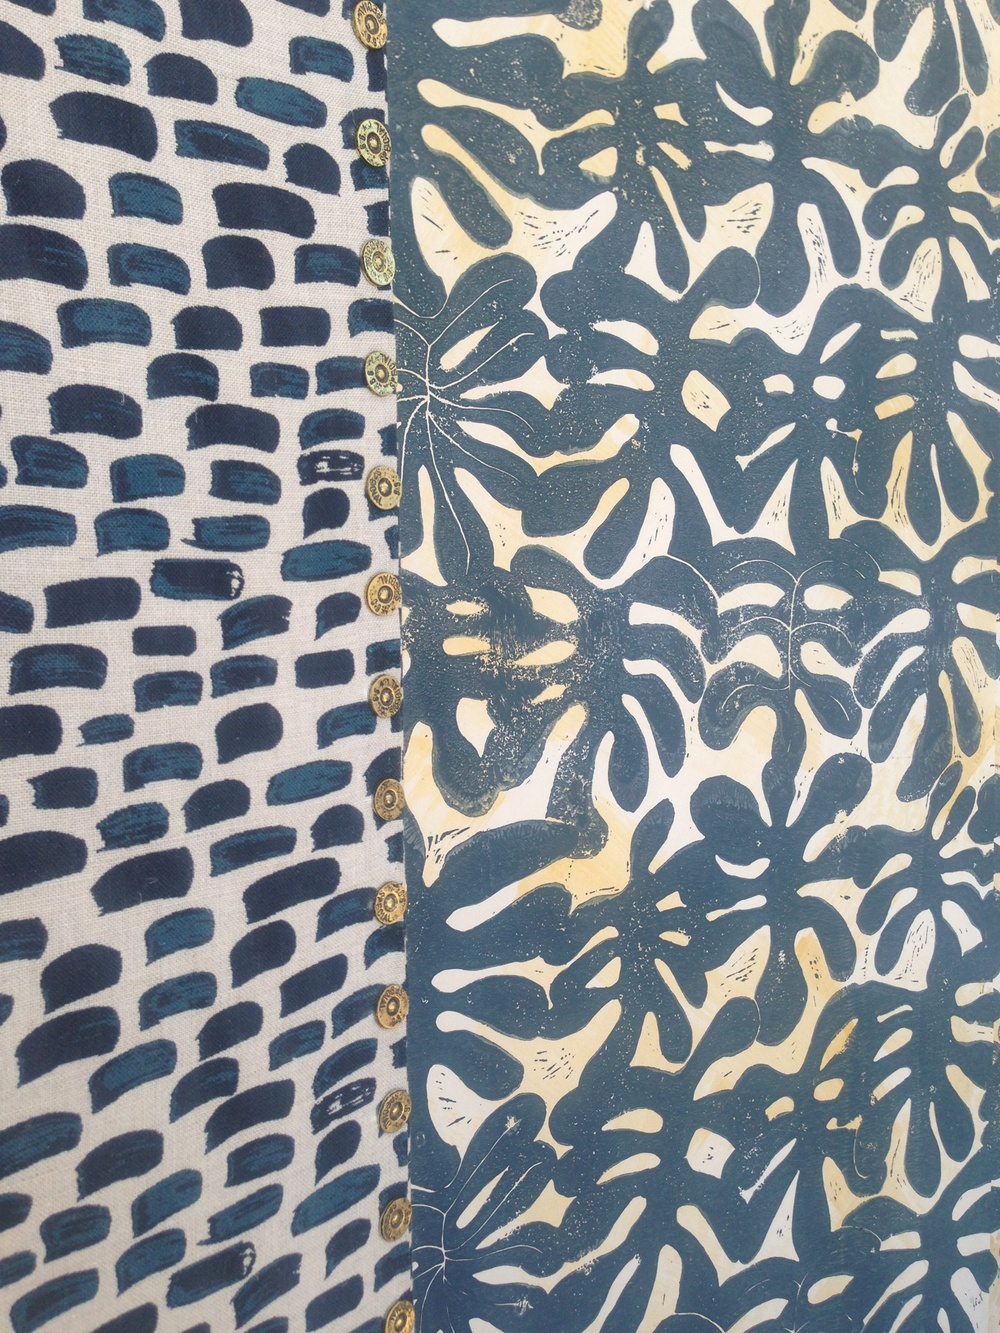 CLOTH & KIND :: LCDQ Legends Window, Screen Fabric.jpg